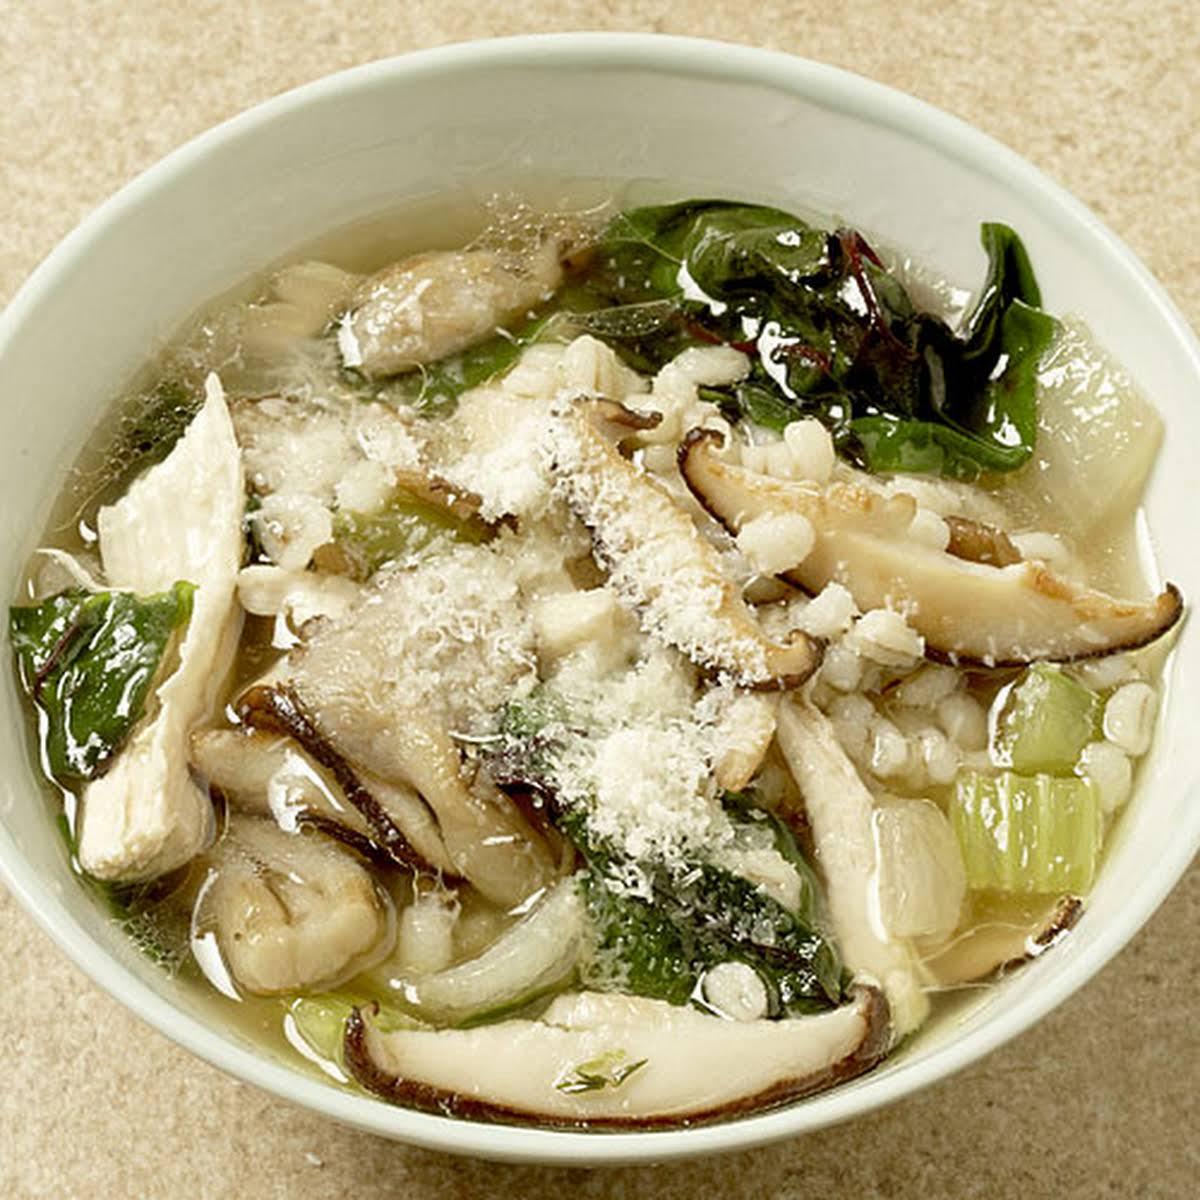 Chicken Soup  following Barley, Mushrooms, and Greens